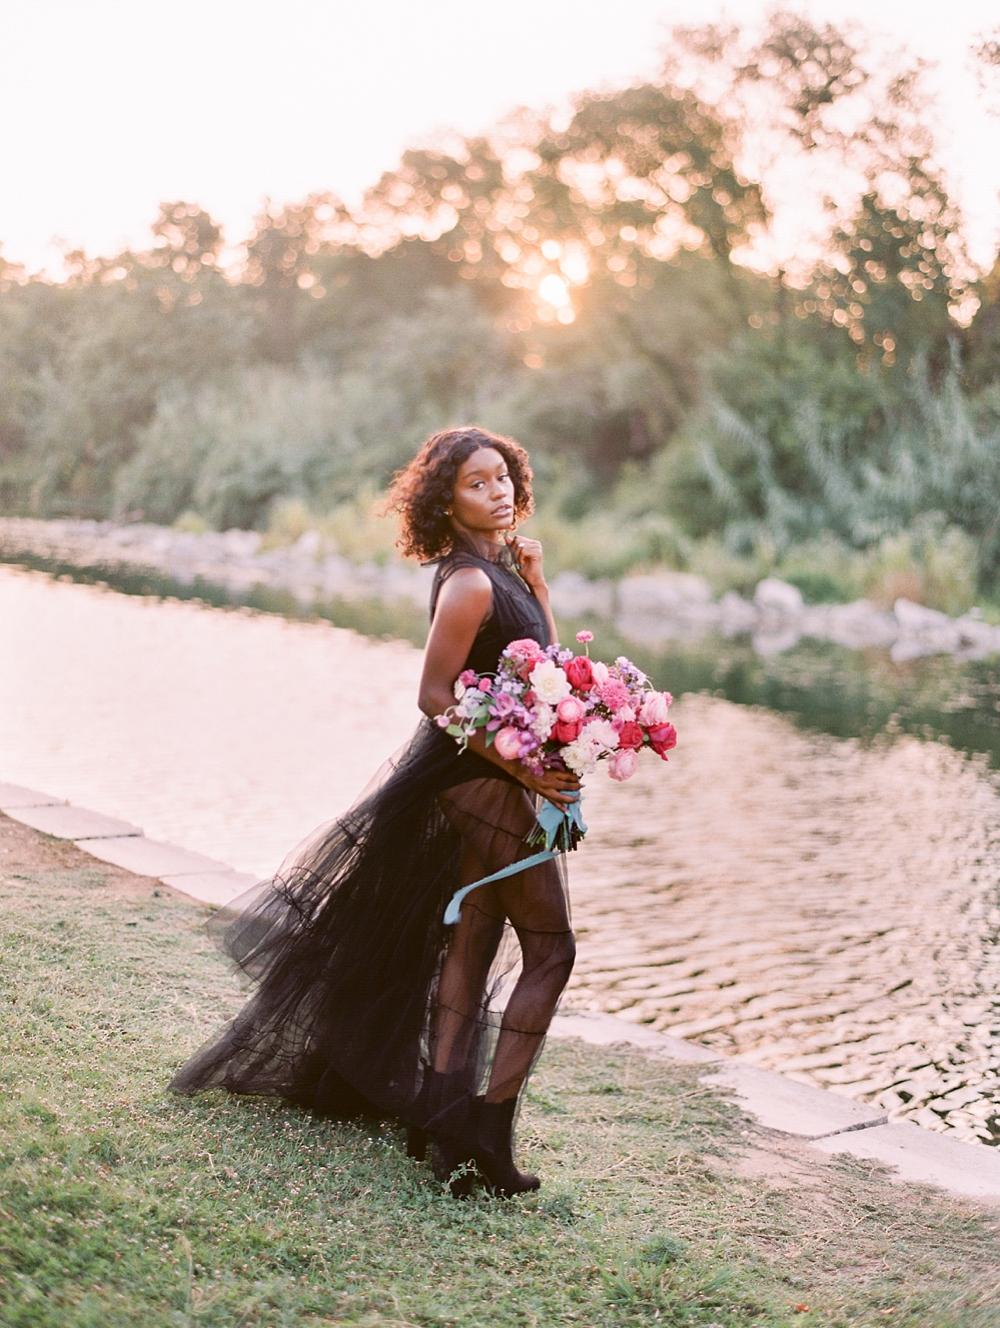 kristin-la-voie-photography-AUSTIN-wedding-BOUDOIR-photographer-34